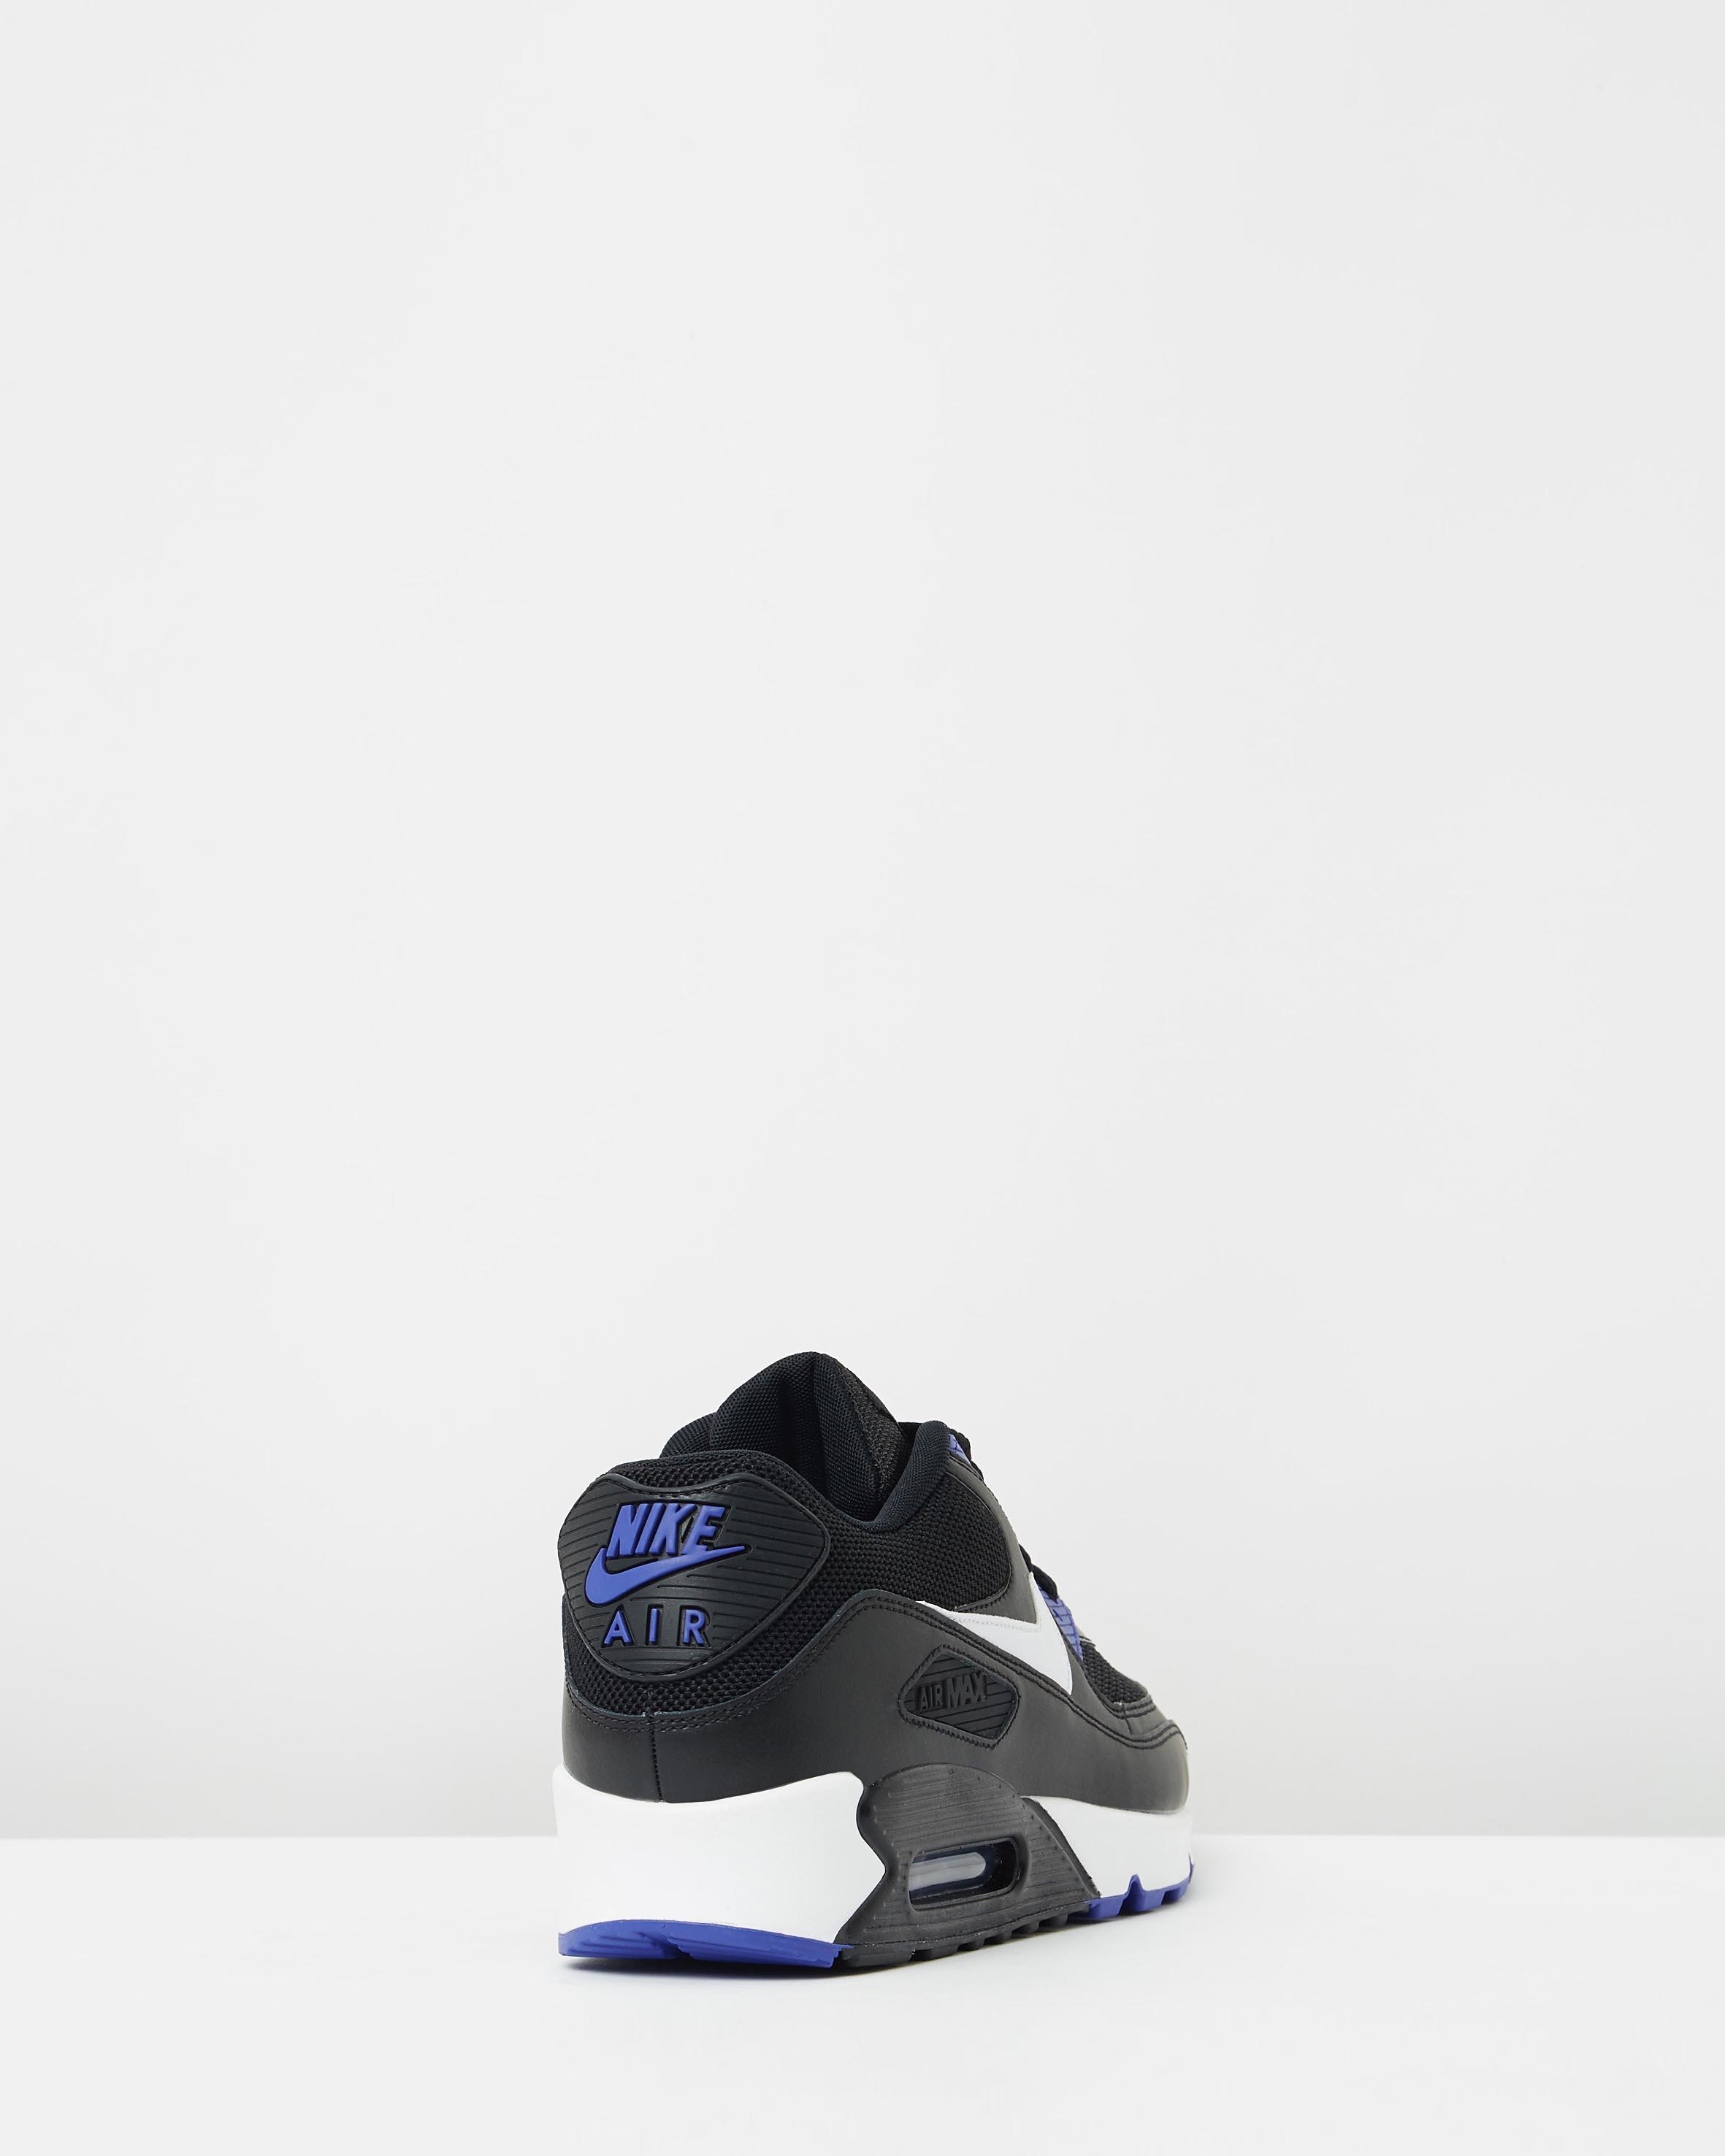 premium selection aa845 201ef Nike Air Max 90 Essential Black White & Persian Violet